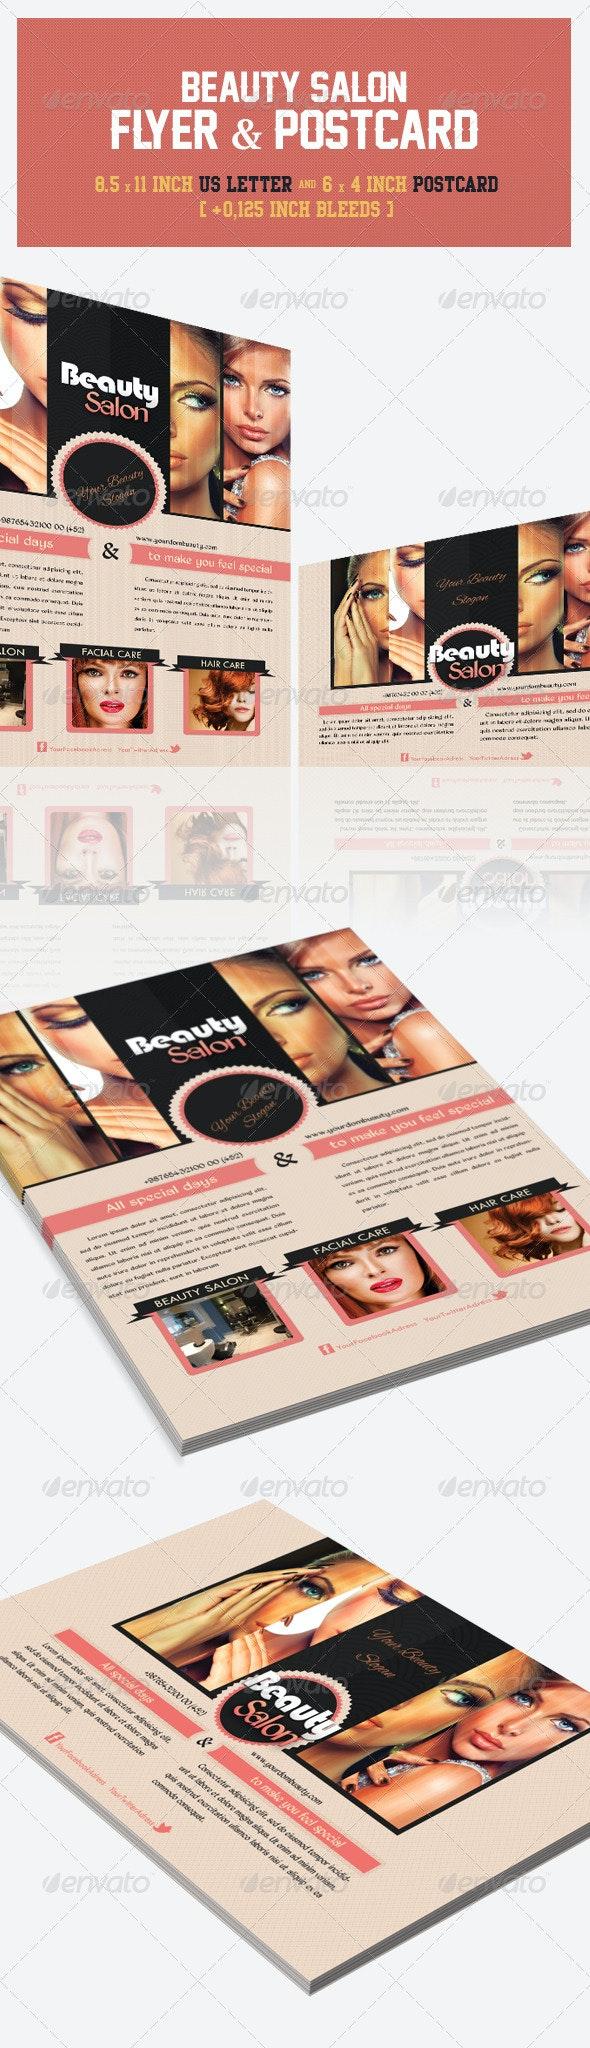 Beauty Salon Flyer & Postcard - Corporate Flyers